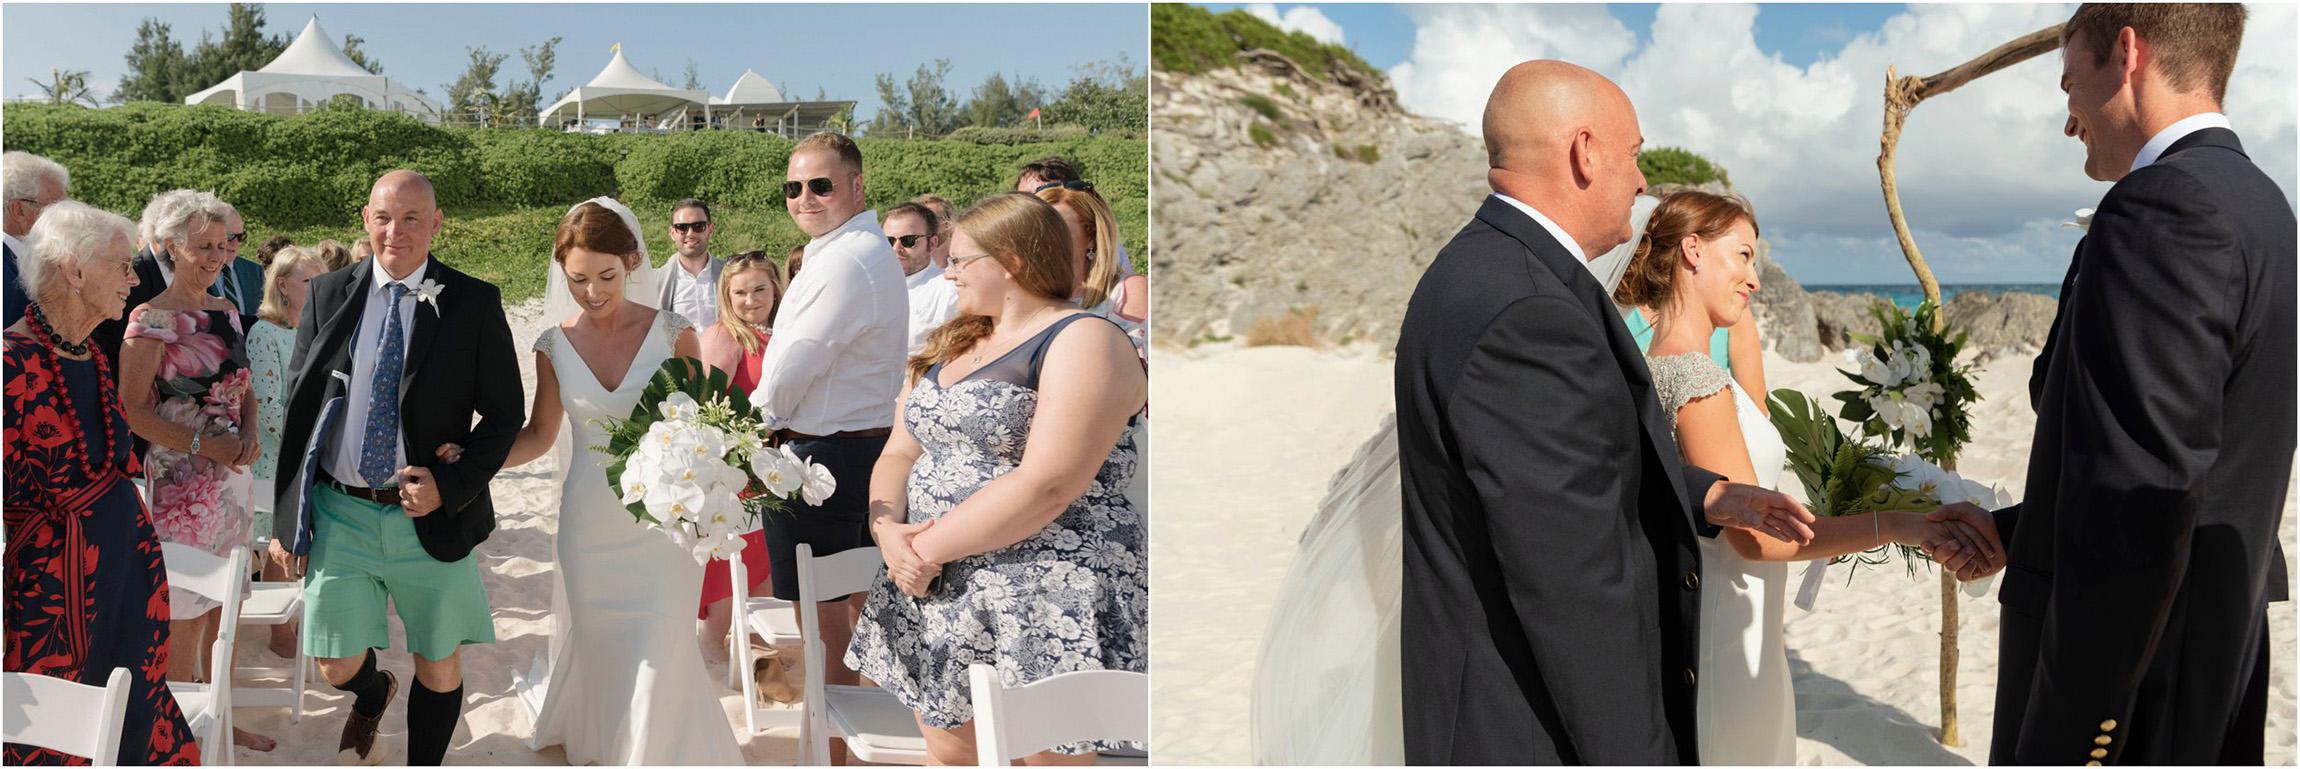 ©FianderFoto_Bermuda Wedding Photographer_Mid Ocean_Rachel_Angus_024.jpg